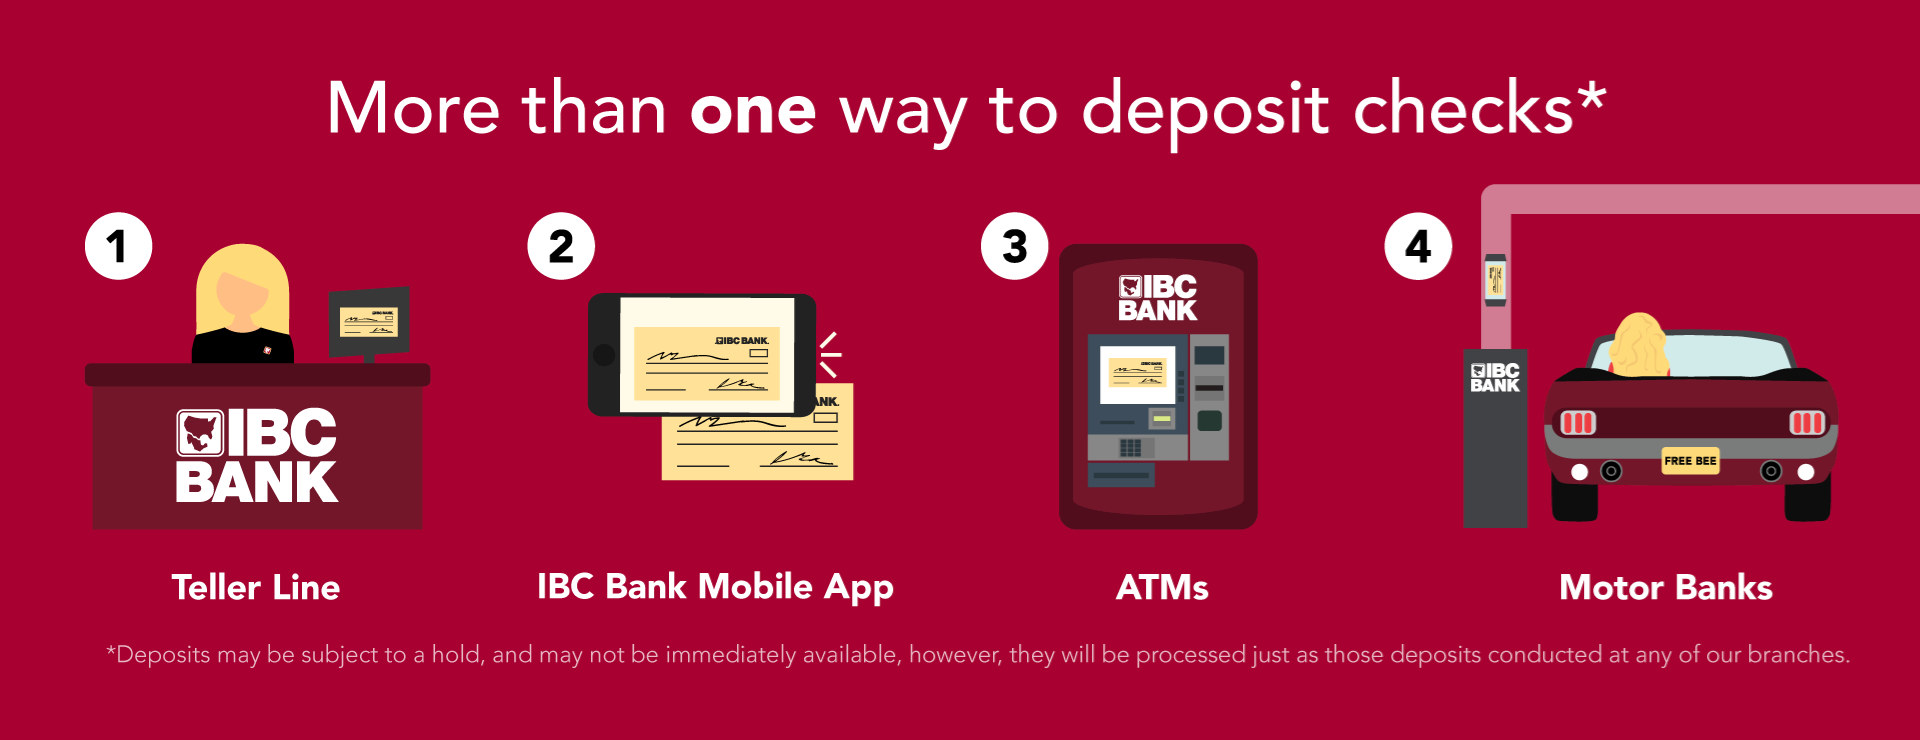 May 2020 - Deposit Checks